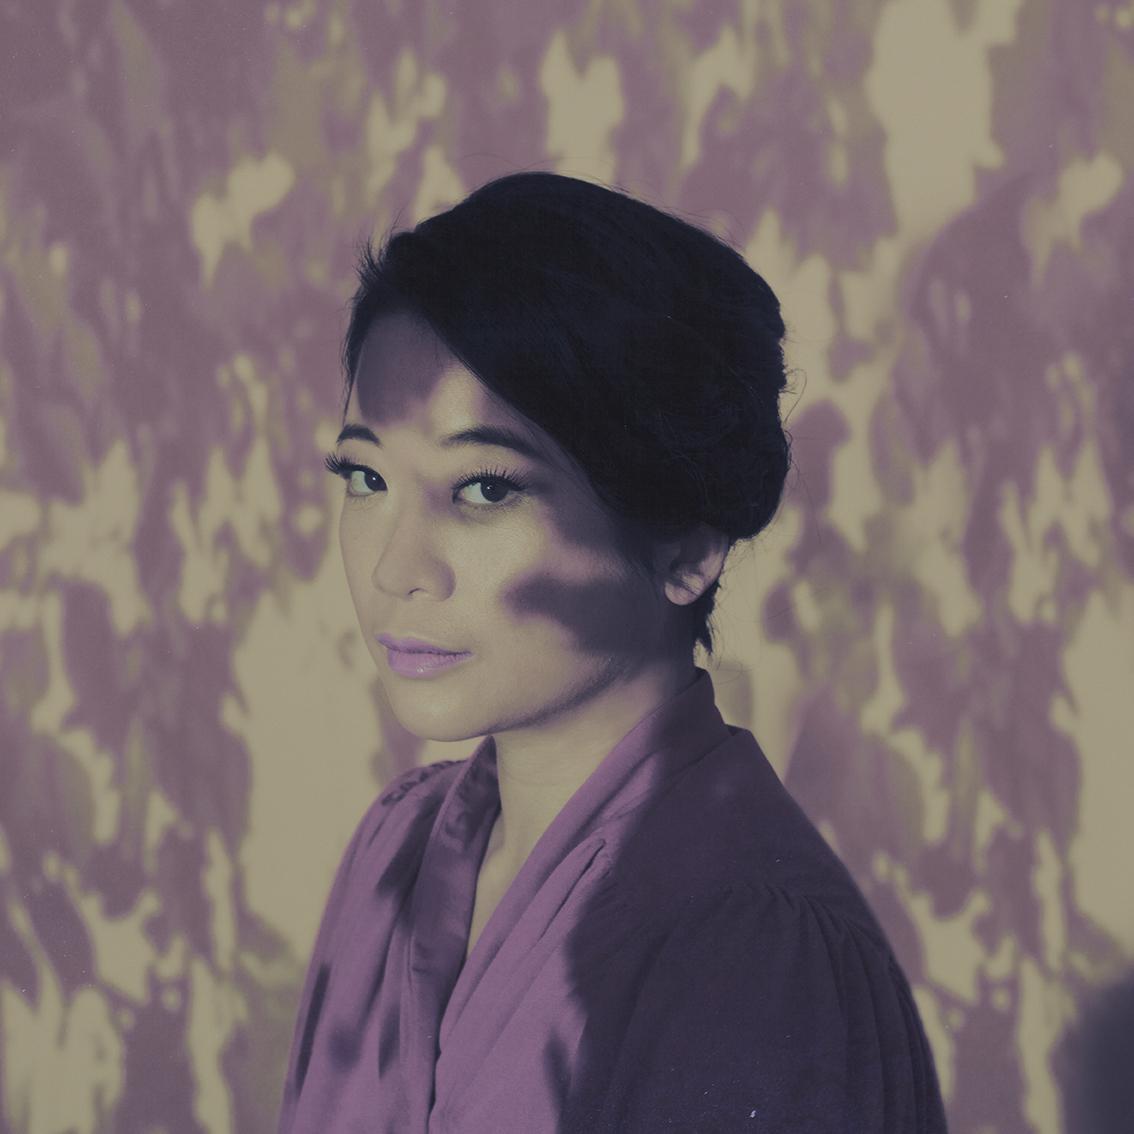 Sophie Koh, image supplied